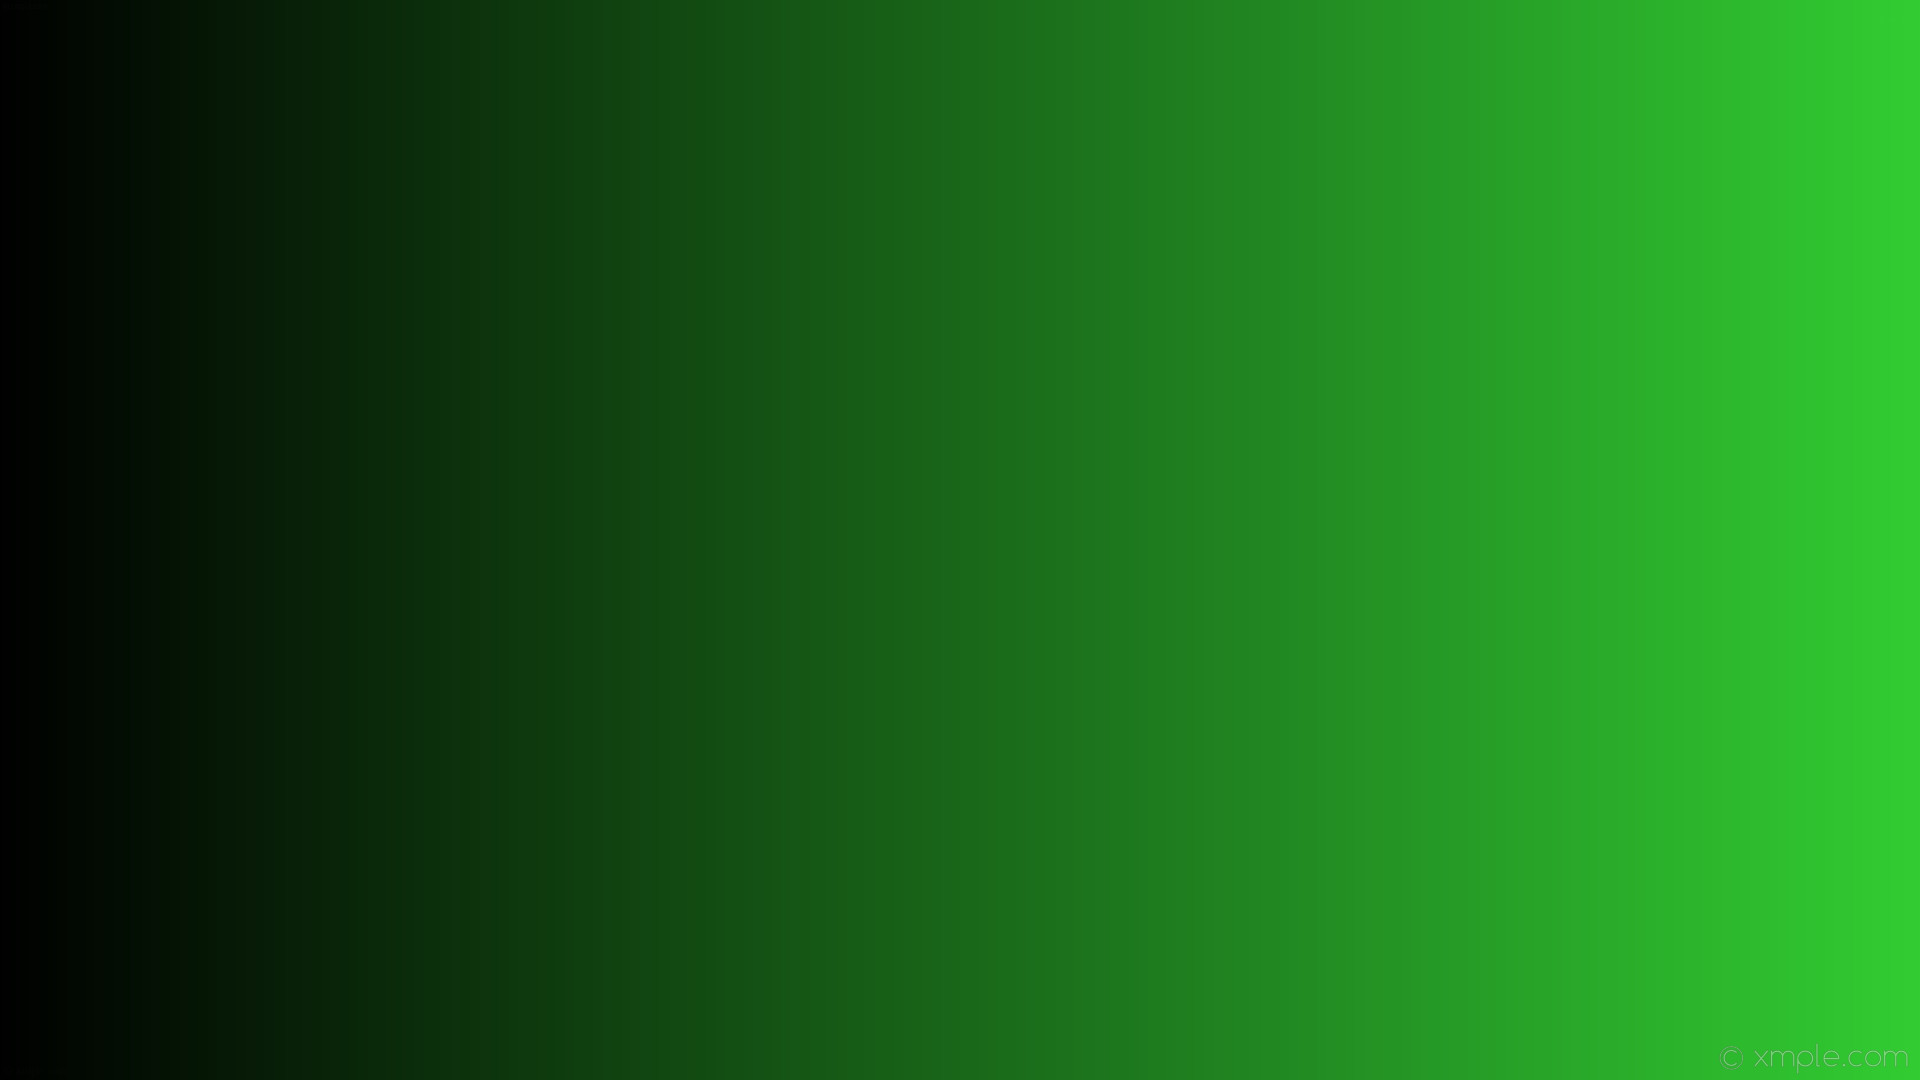 wallpaper gradient green black linear lime green #000000 #32cd32 180°